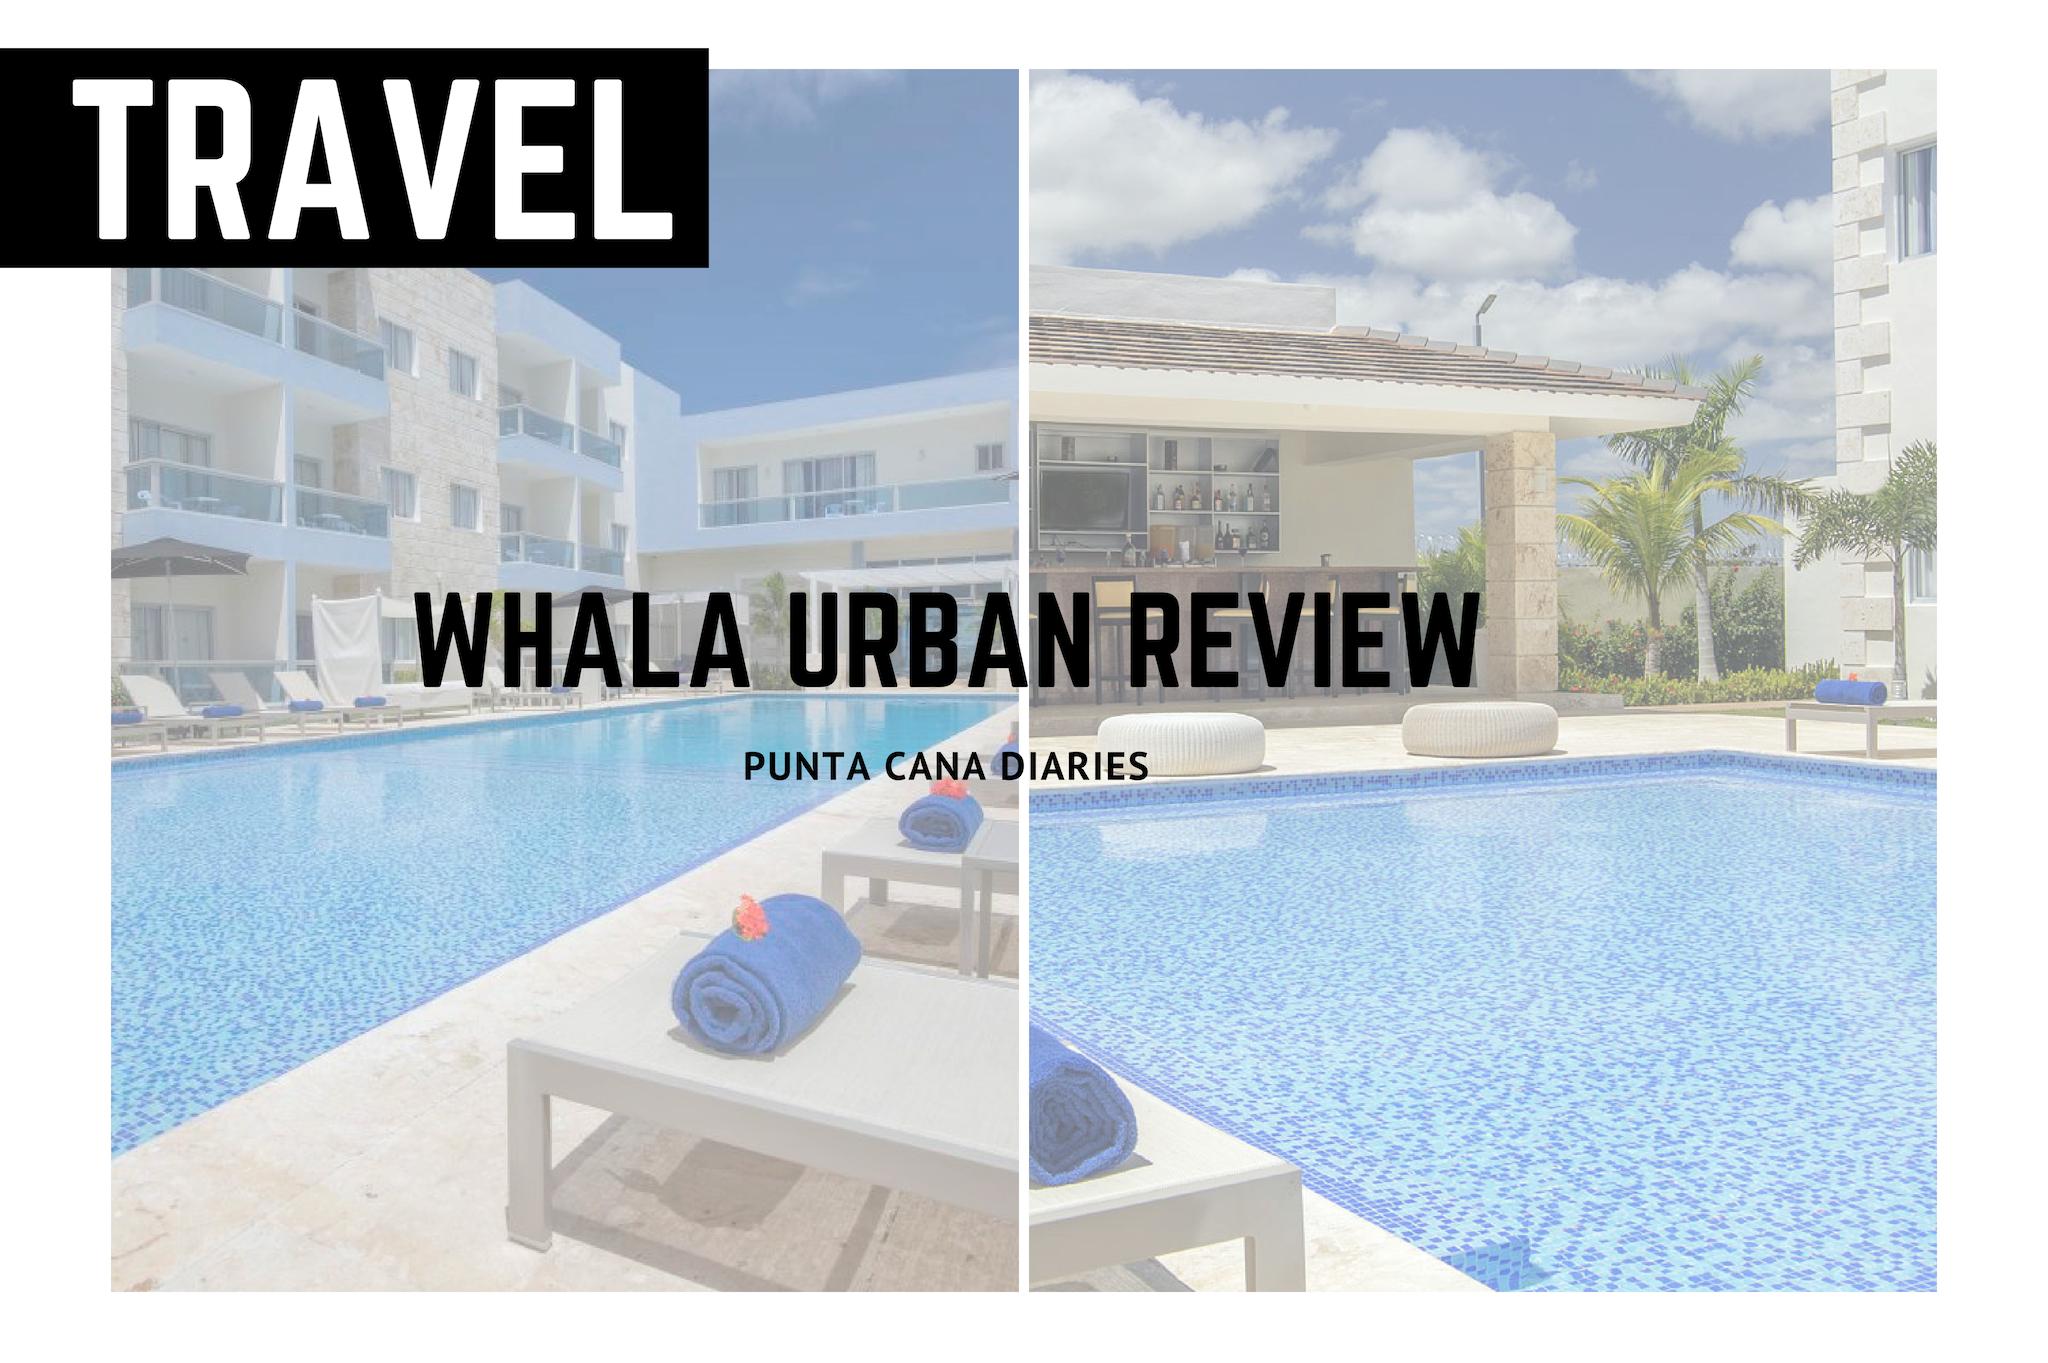 whala urban review punta cana hotel